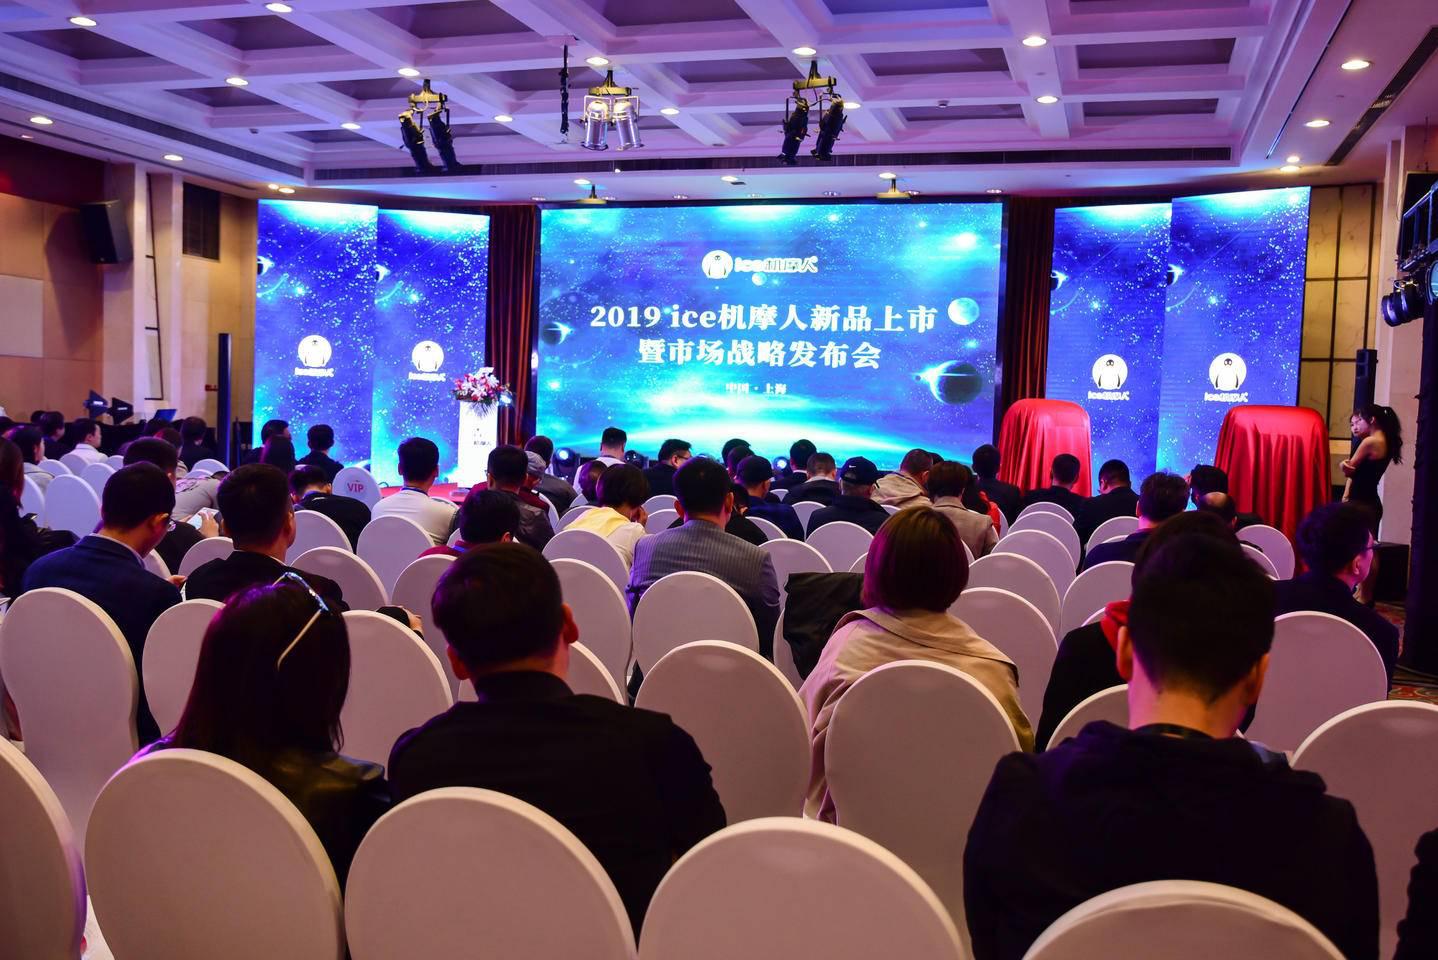 ice机摩人在沪发布战略级Mini机 揭开冰淇淋背后的千亿级市场